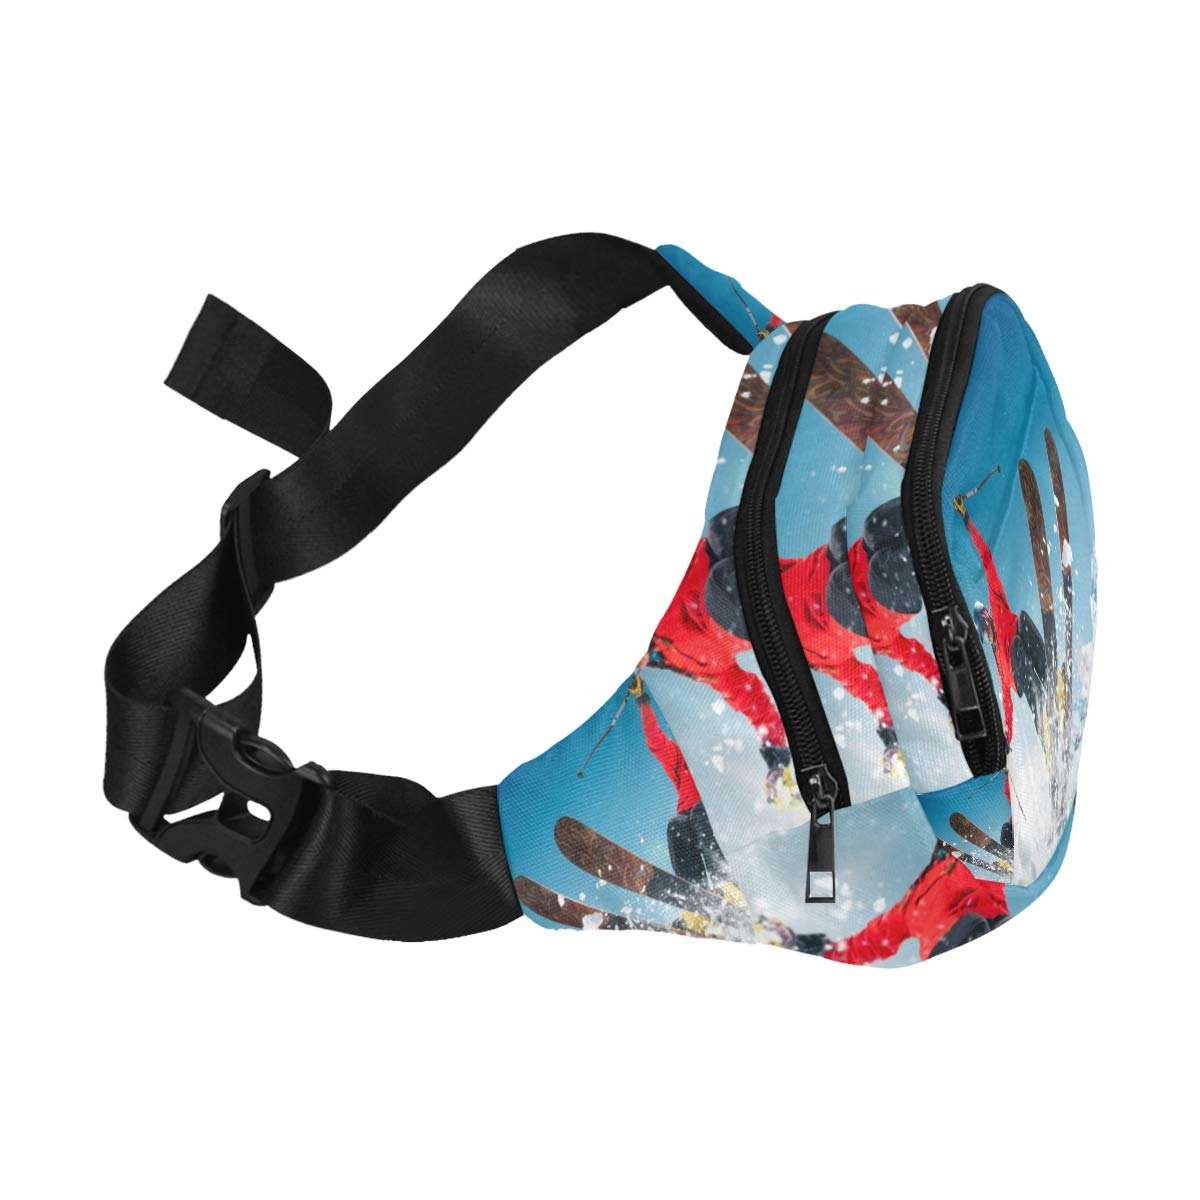 Jump Skiers Extreme Winter Sports Fenny Packs Waist Bags Adjustable Belt Waterproof Nylon Travel Running Sport Vacation Party For Men Women Boys Girls Kids